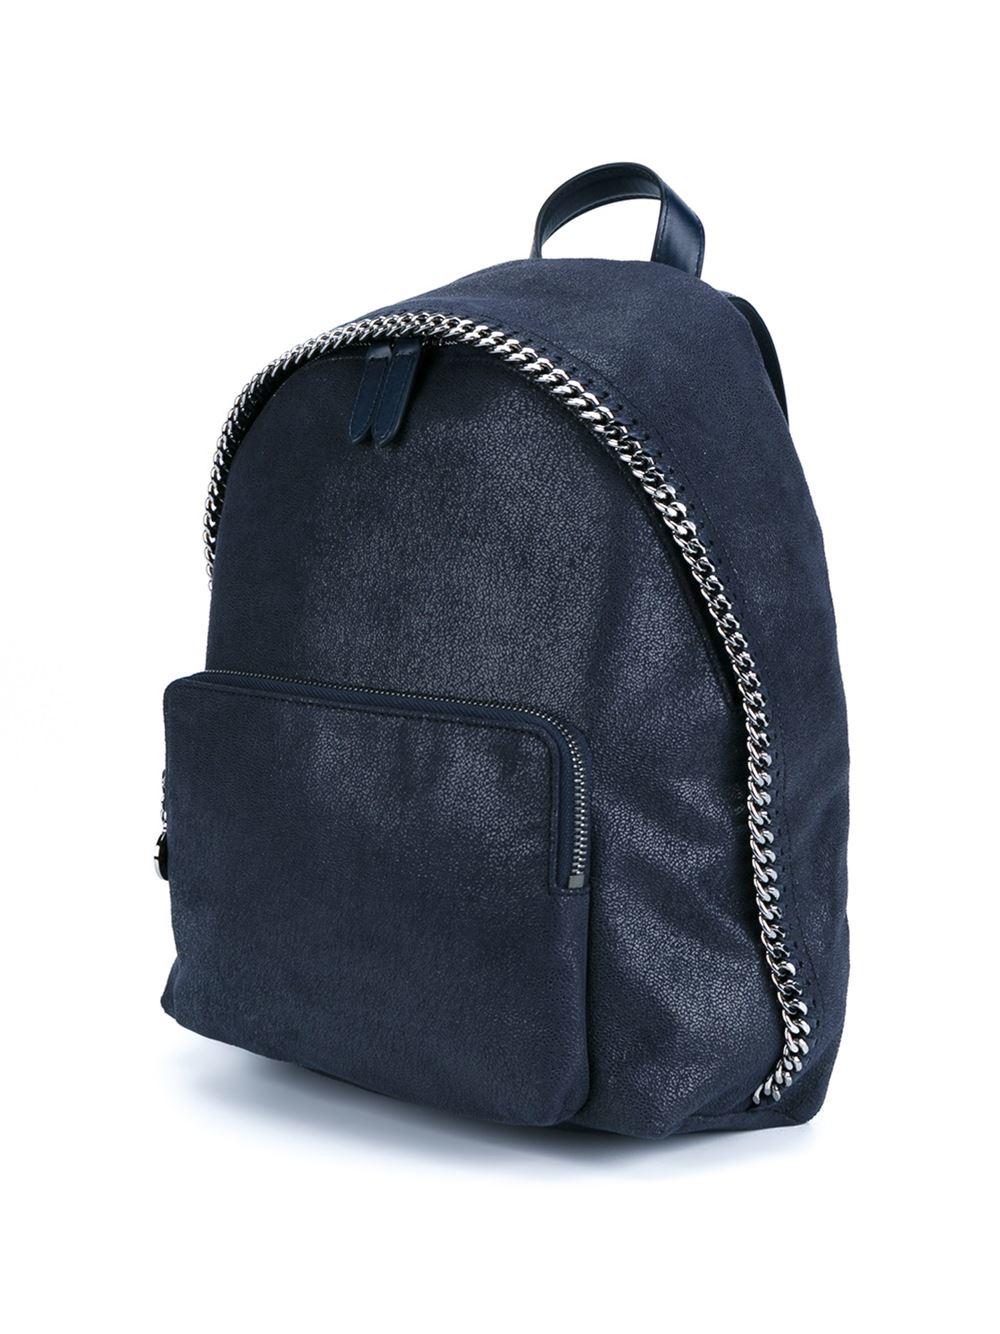 stella mccartney fallabella backpack in blue lyst. Black Bedroom Furniture Sets. Home Design Ideas